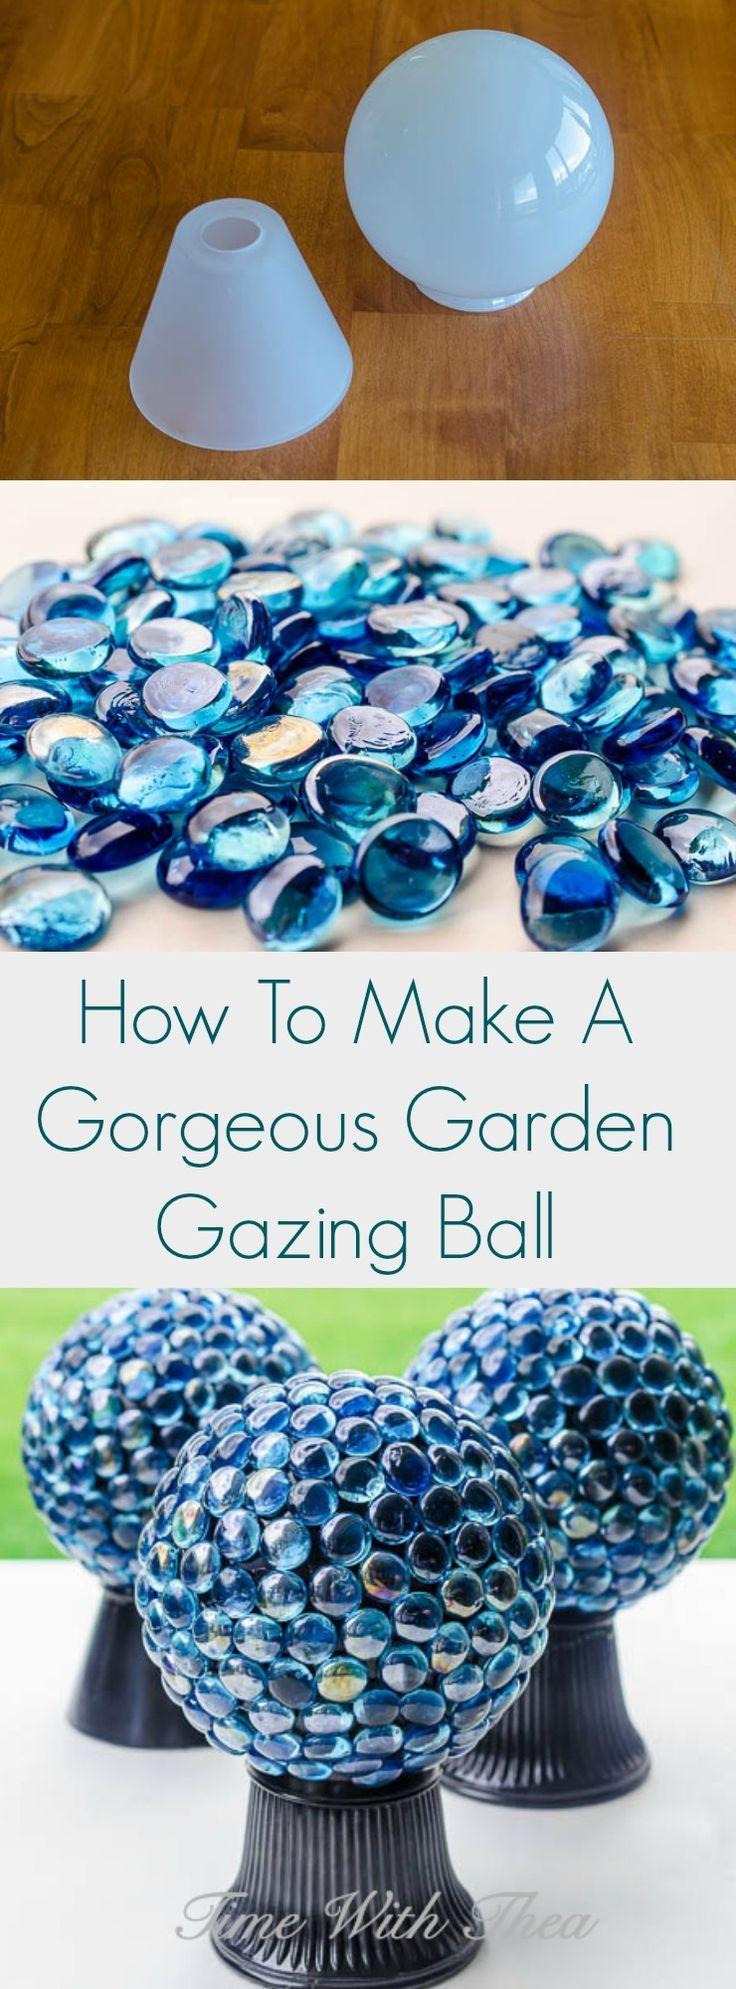 how to make a gorgeous garden gazing ball | dollar stores, gardens